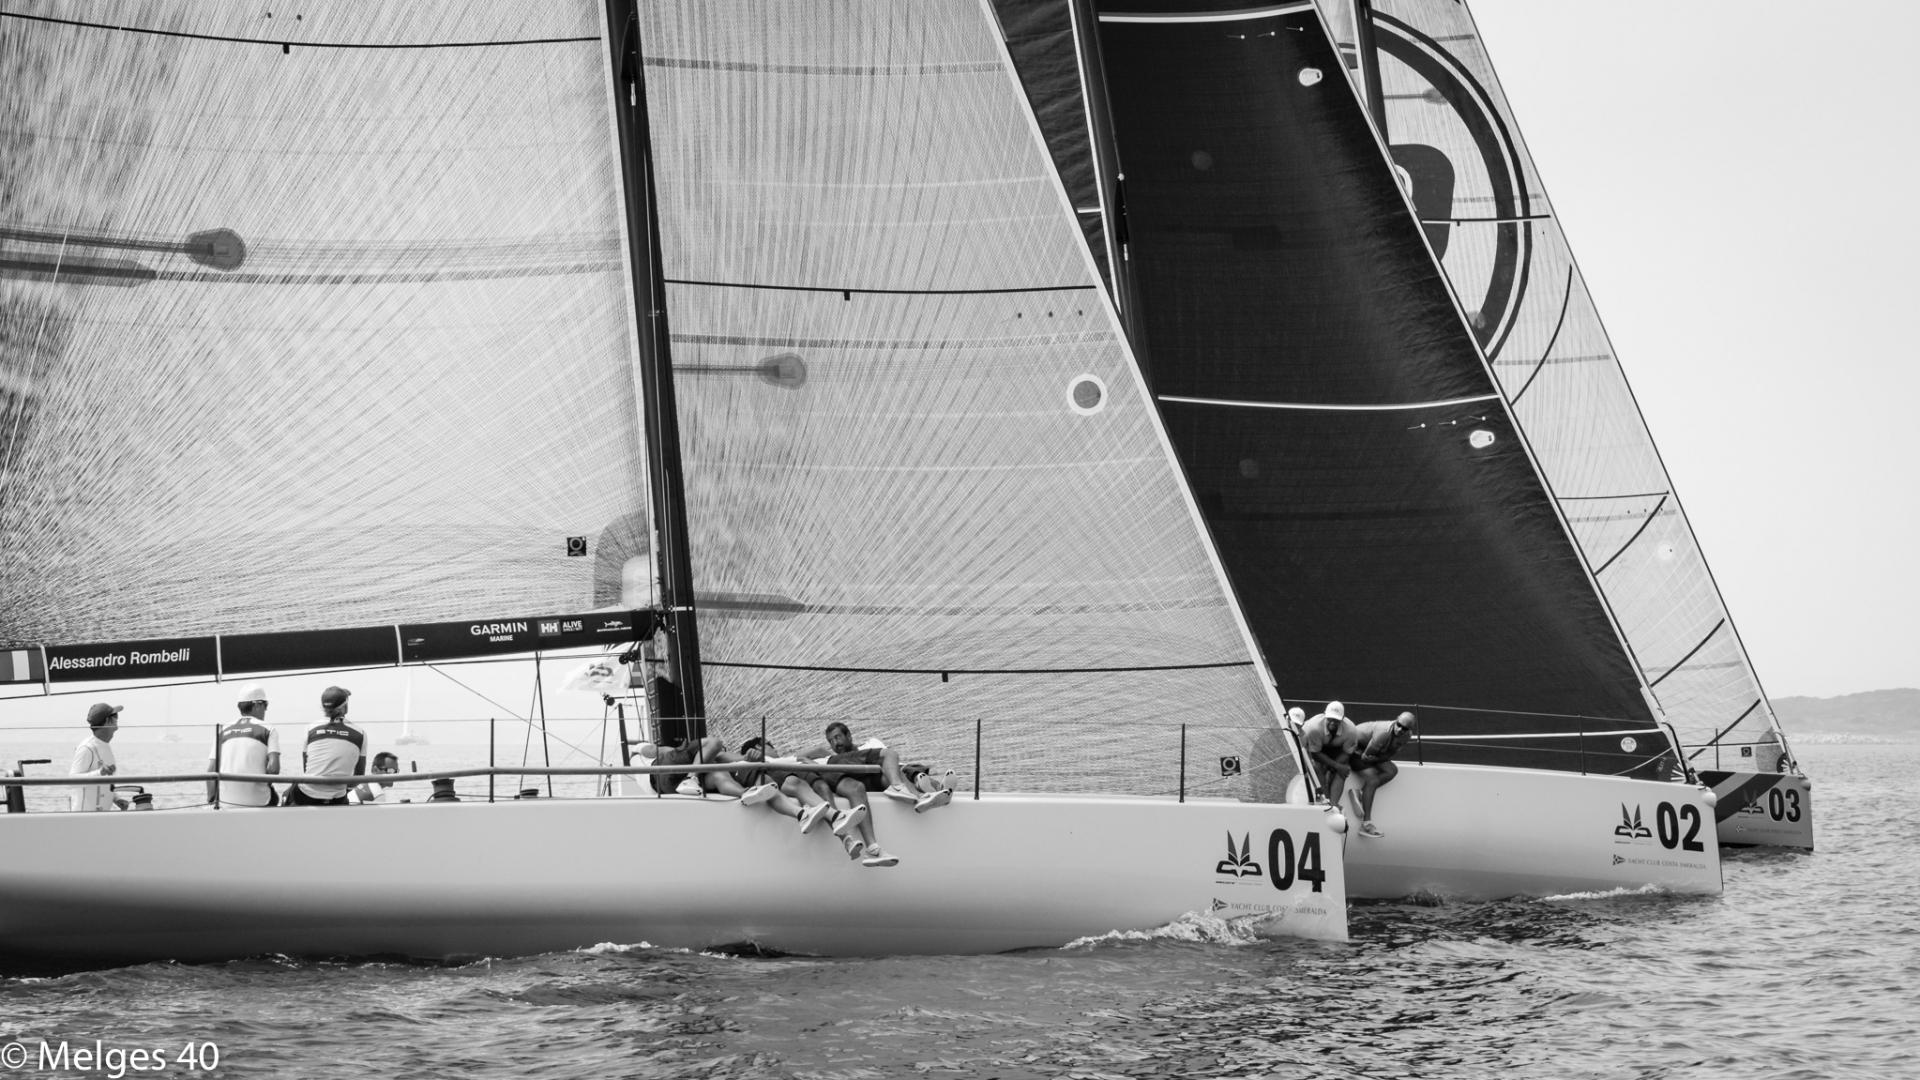 Melges 40 Grand Prix - Foto Day 2 online - NEWS - Yacht Club Costa Smeralda